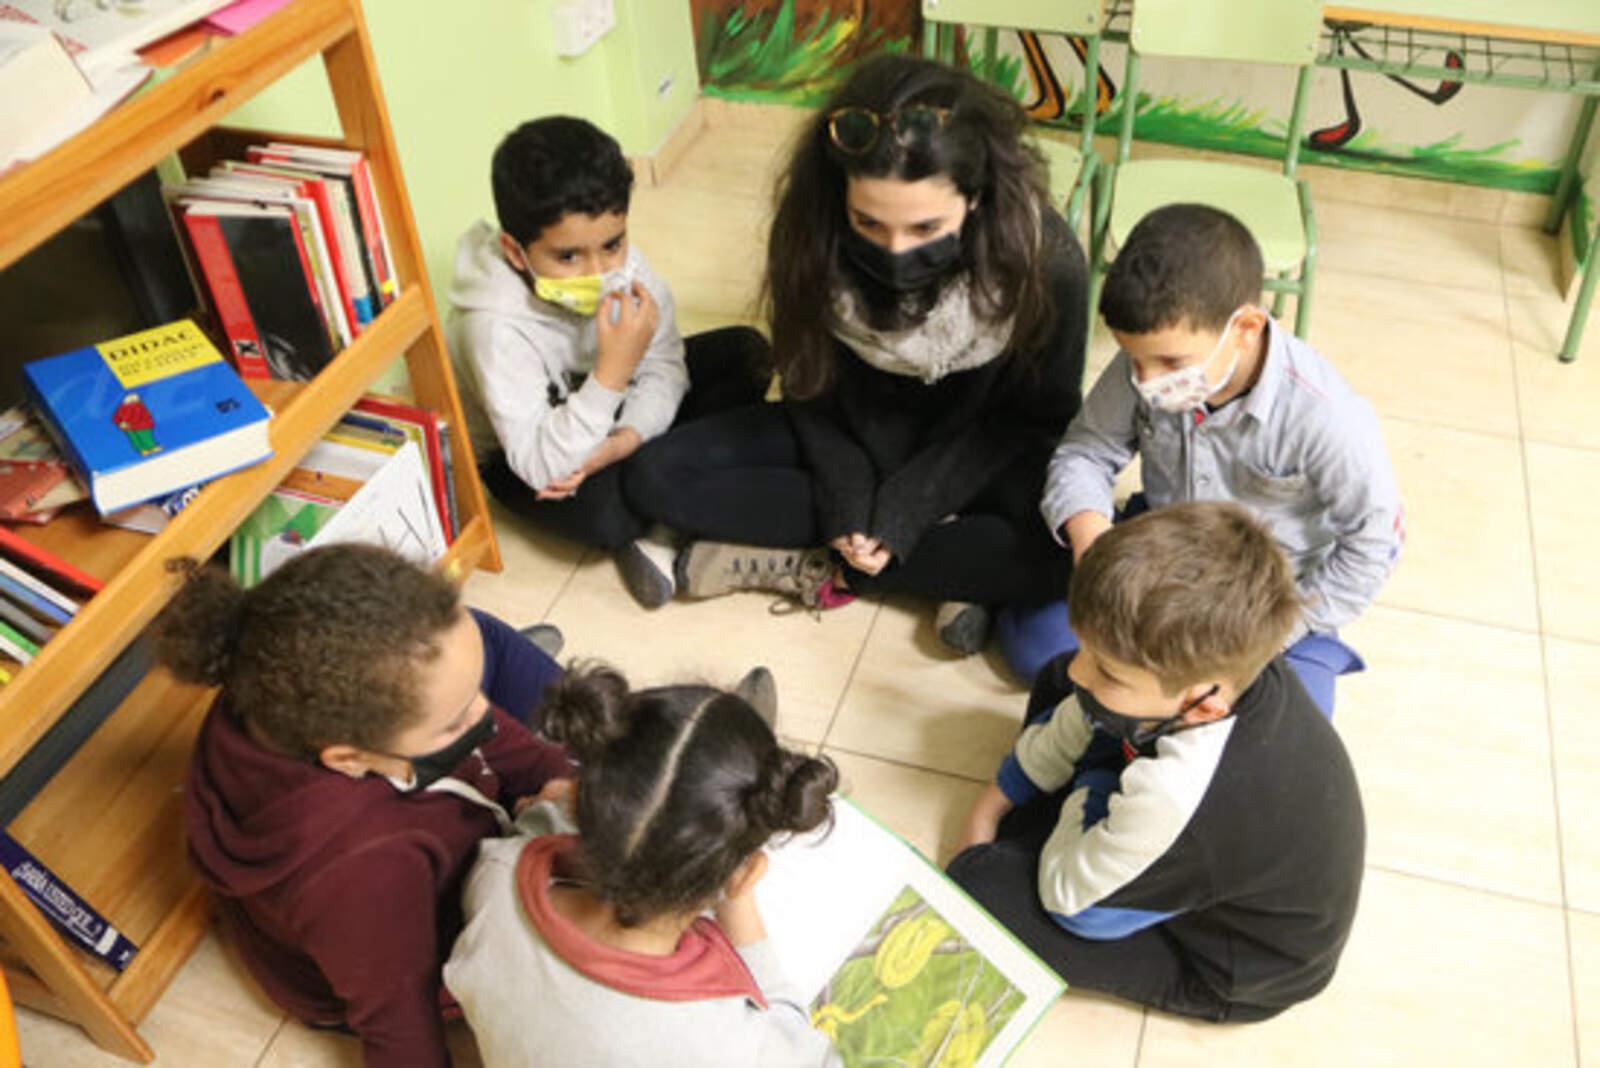 Un grup d'infants a l'escola